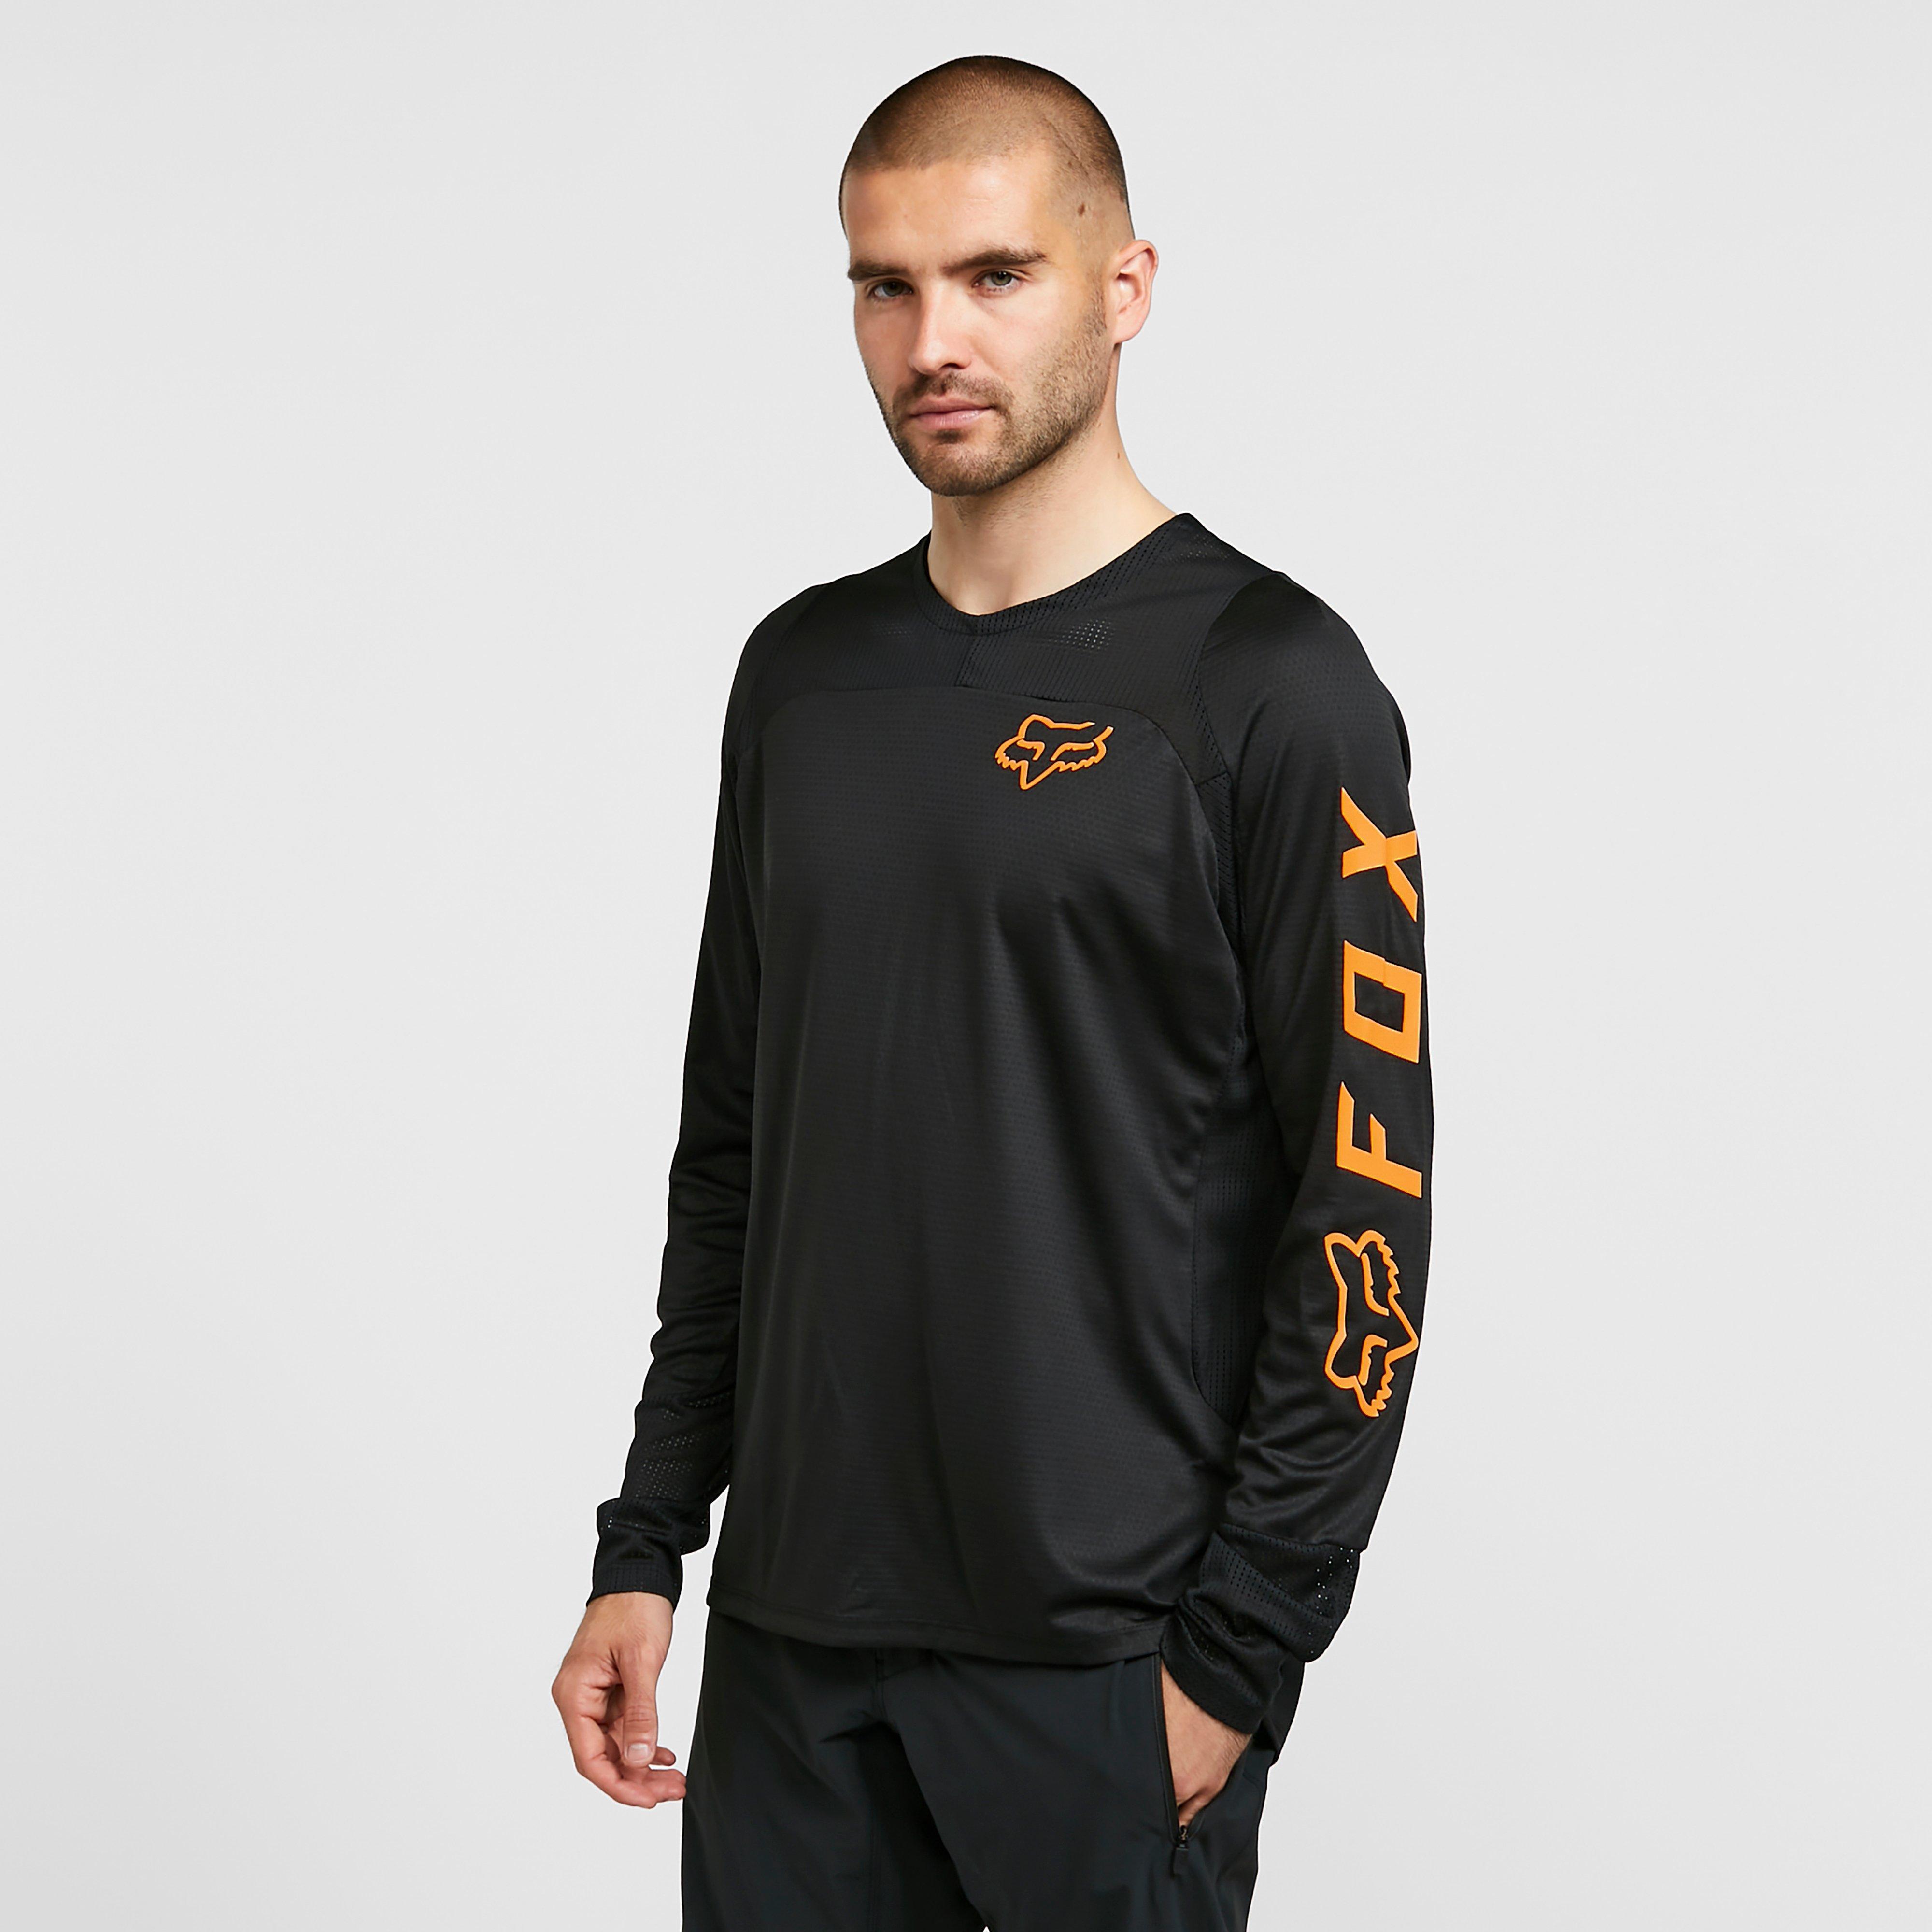 Image of Fox Men's Defend Long Sleeve Jersey - Black/Blk, Black/BLK